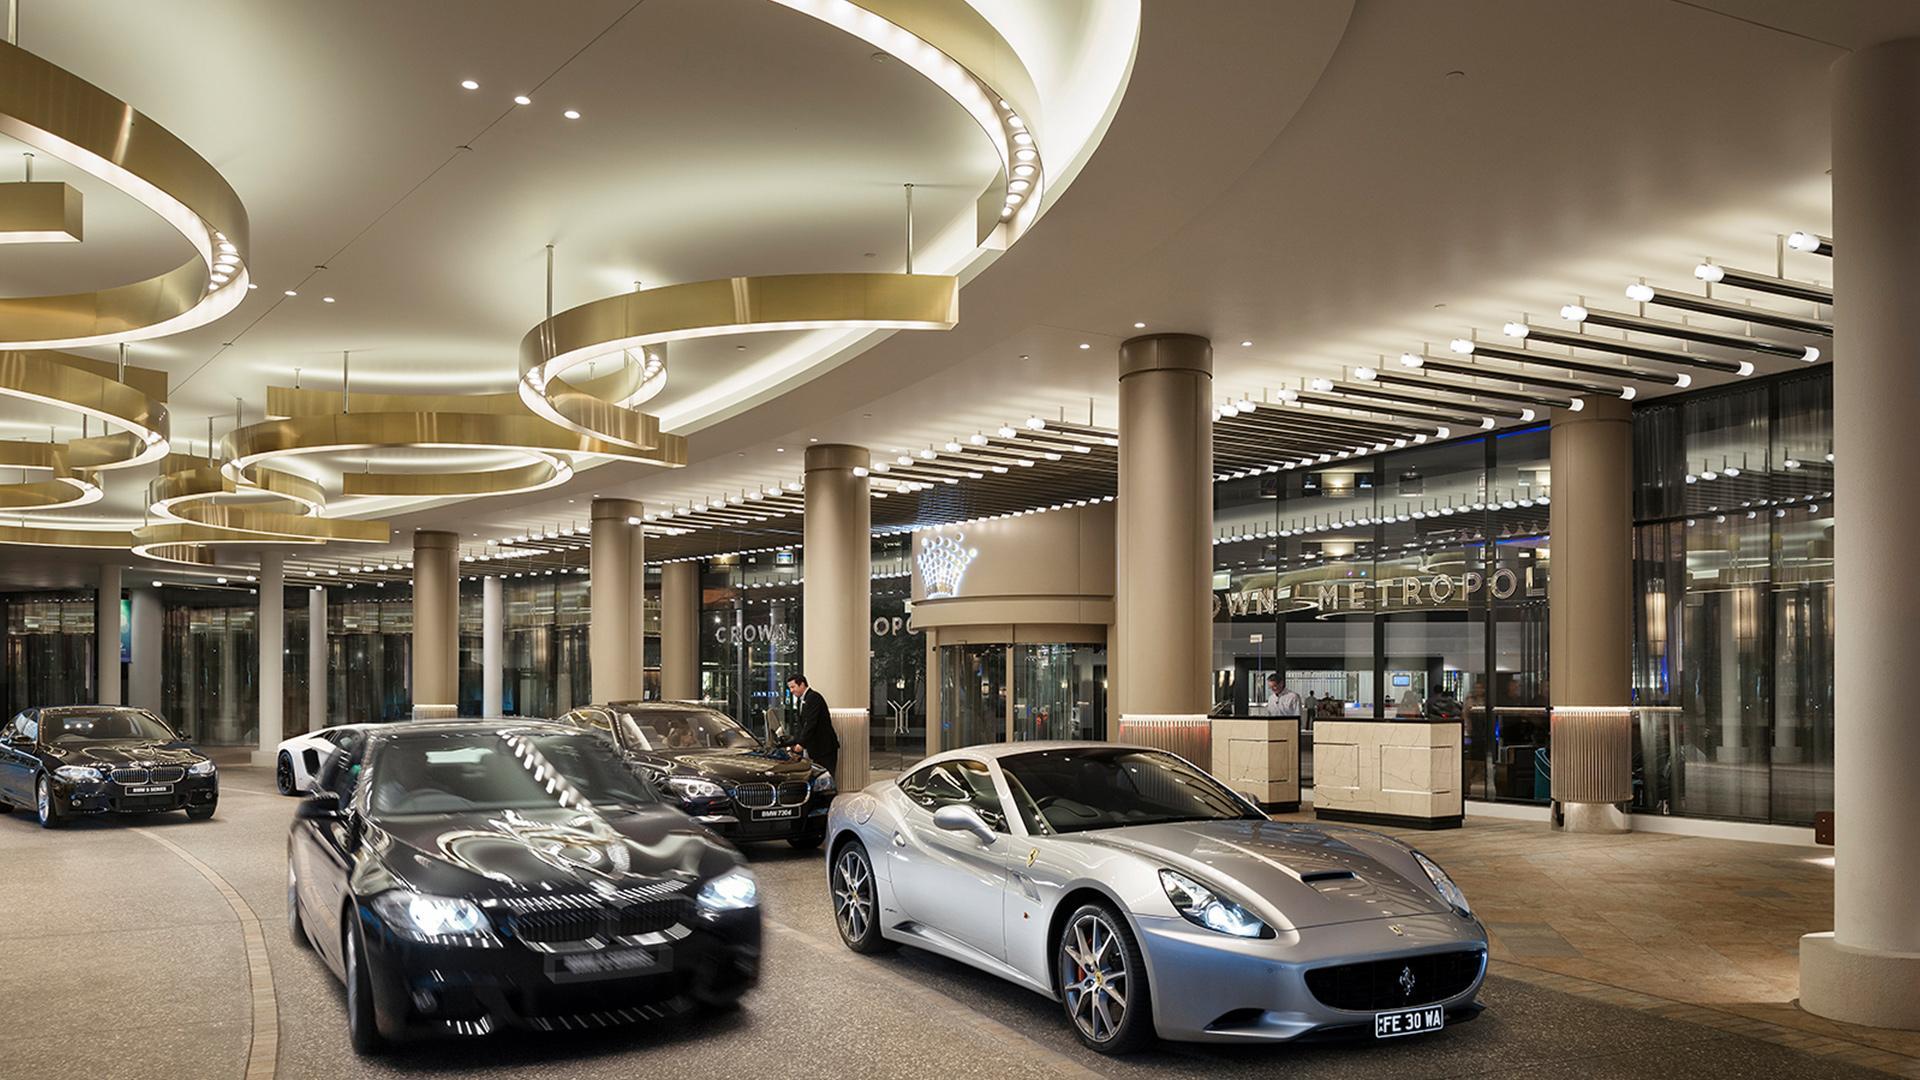 Crown casino valet parking cost harrahs terrace hotel casino in tunica